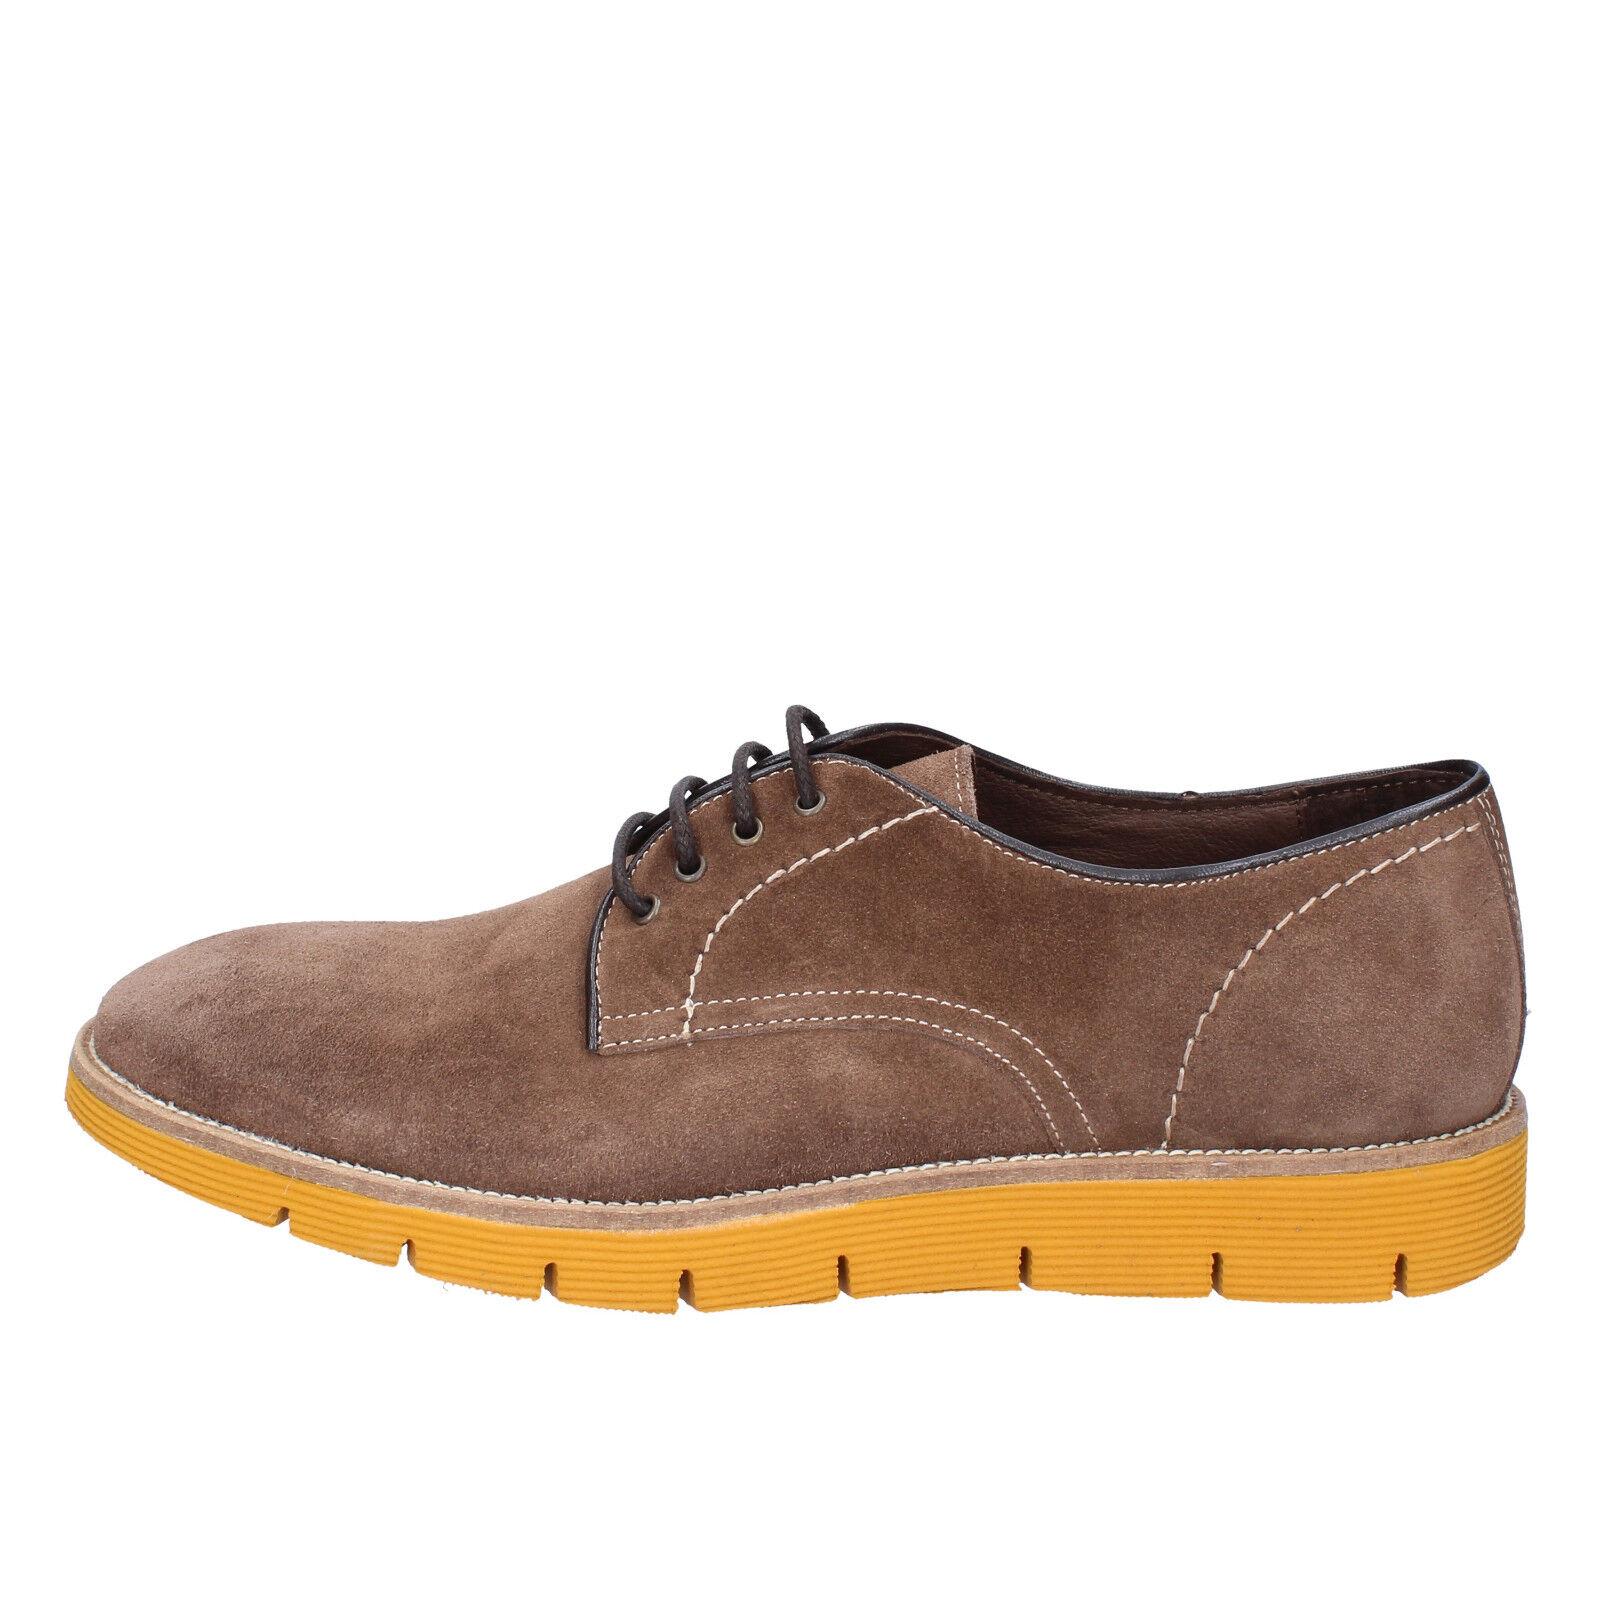 Mens shoes EVC 8 (EU 42) elegant suede brown AD746-B